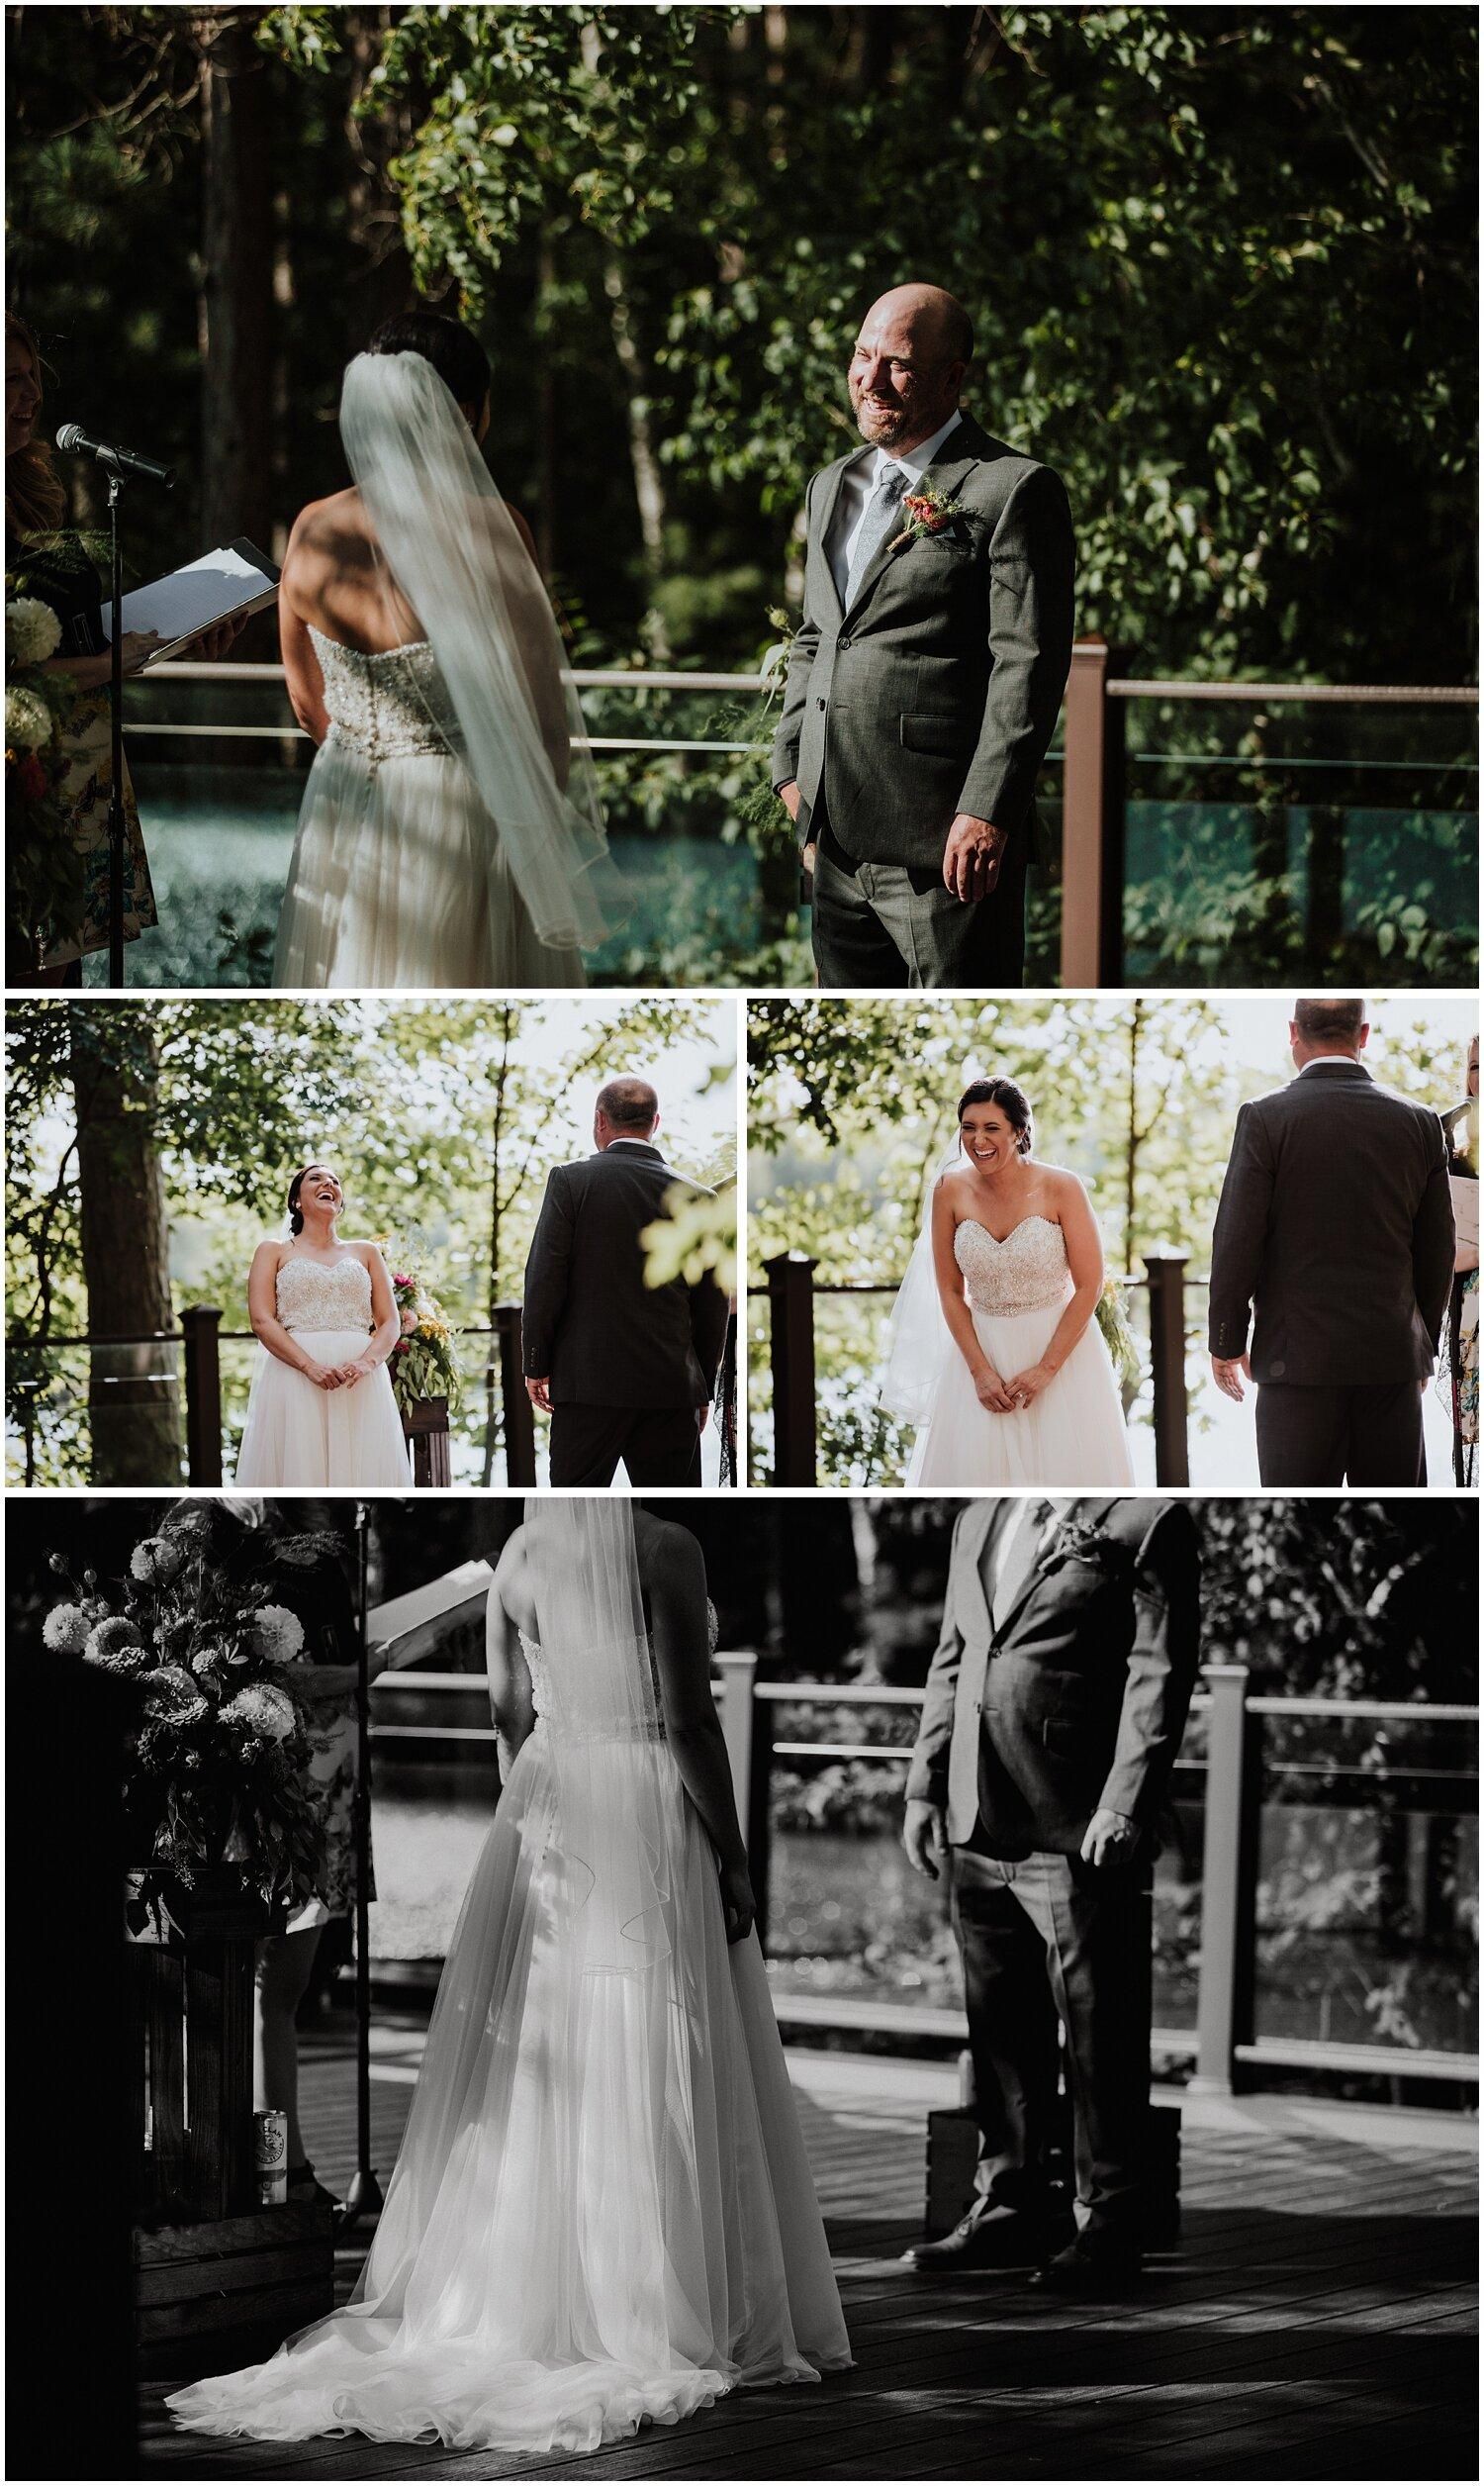 manitowish-waters-wedding_0053.jpg